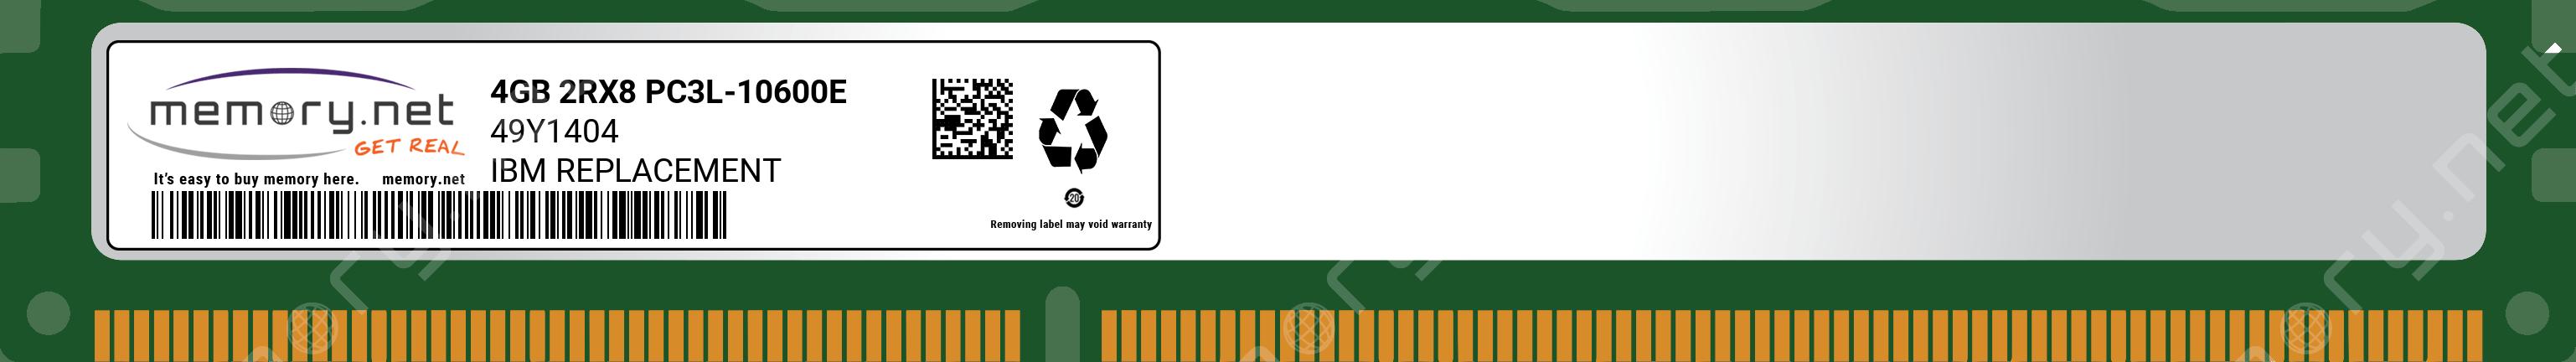 49Y1404